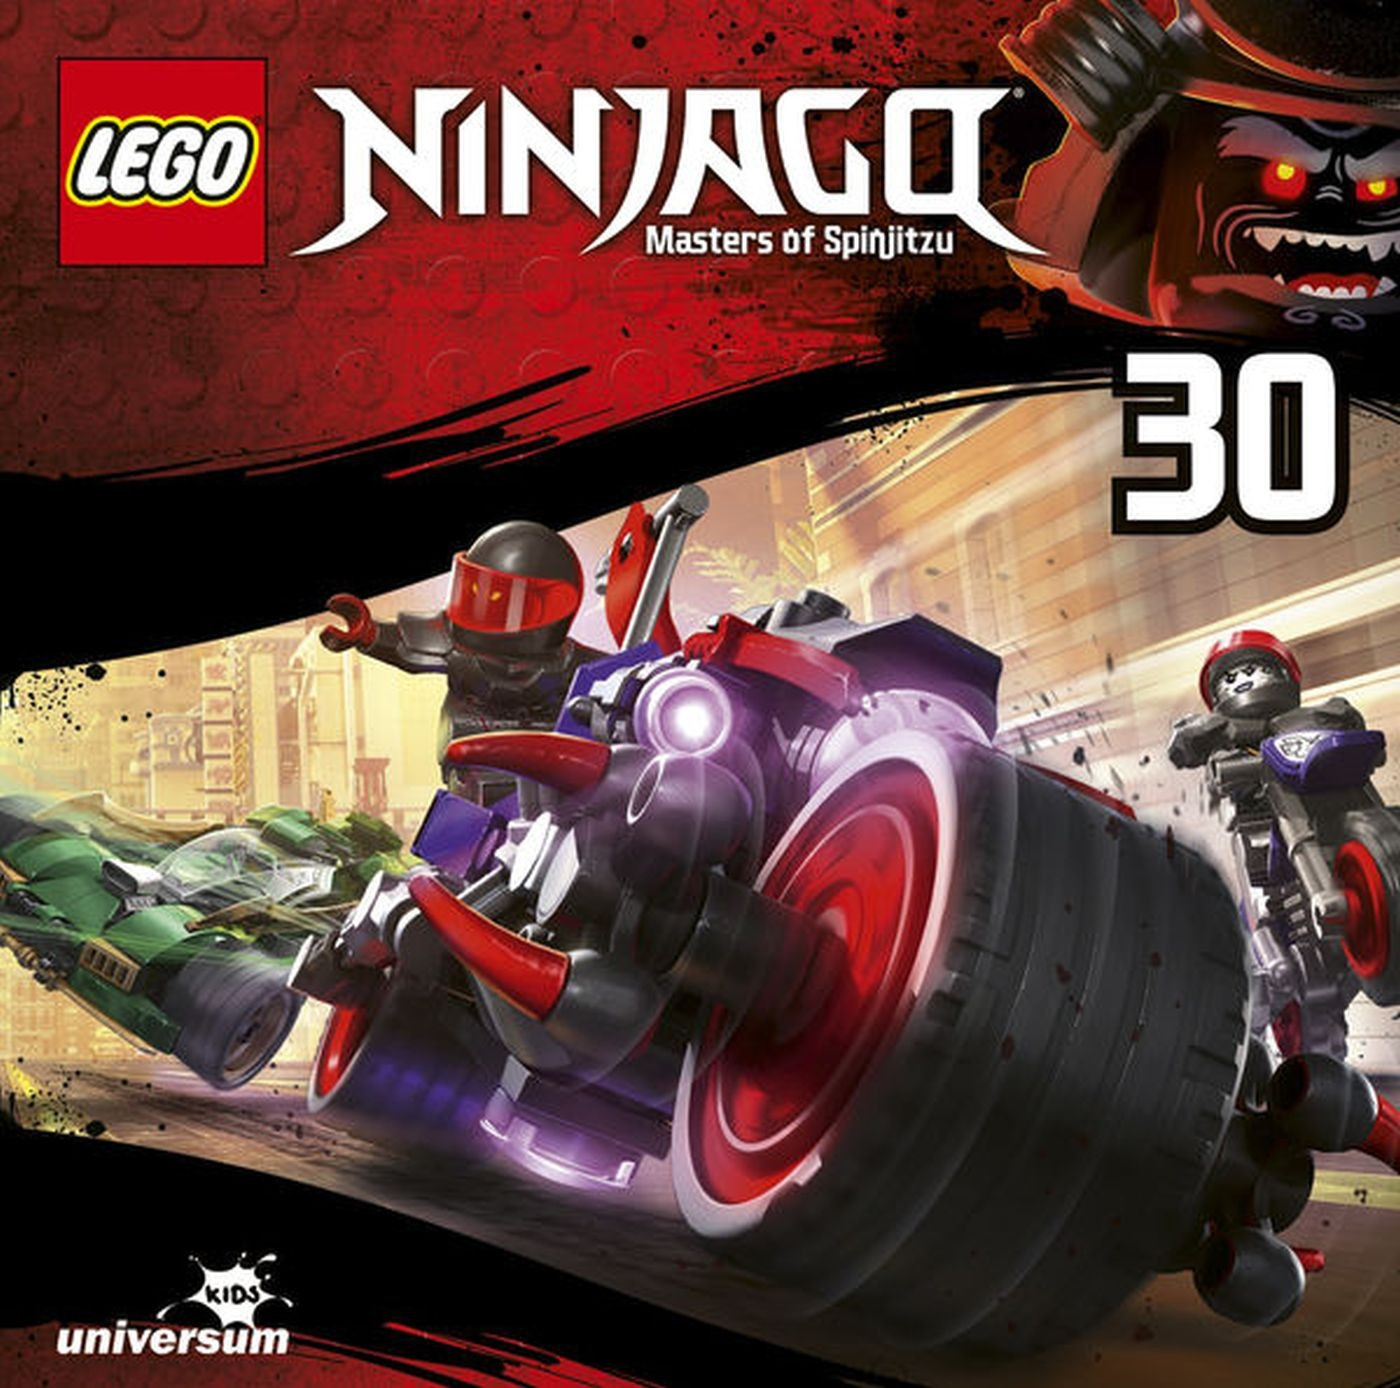 LEGO Ninjago 8. Staffel (CD 30)